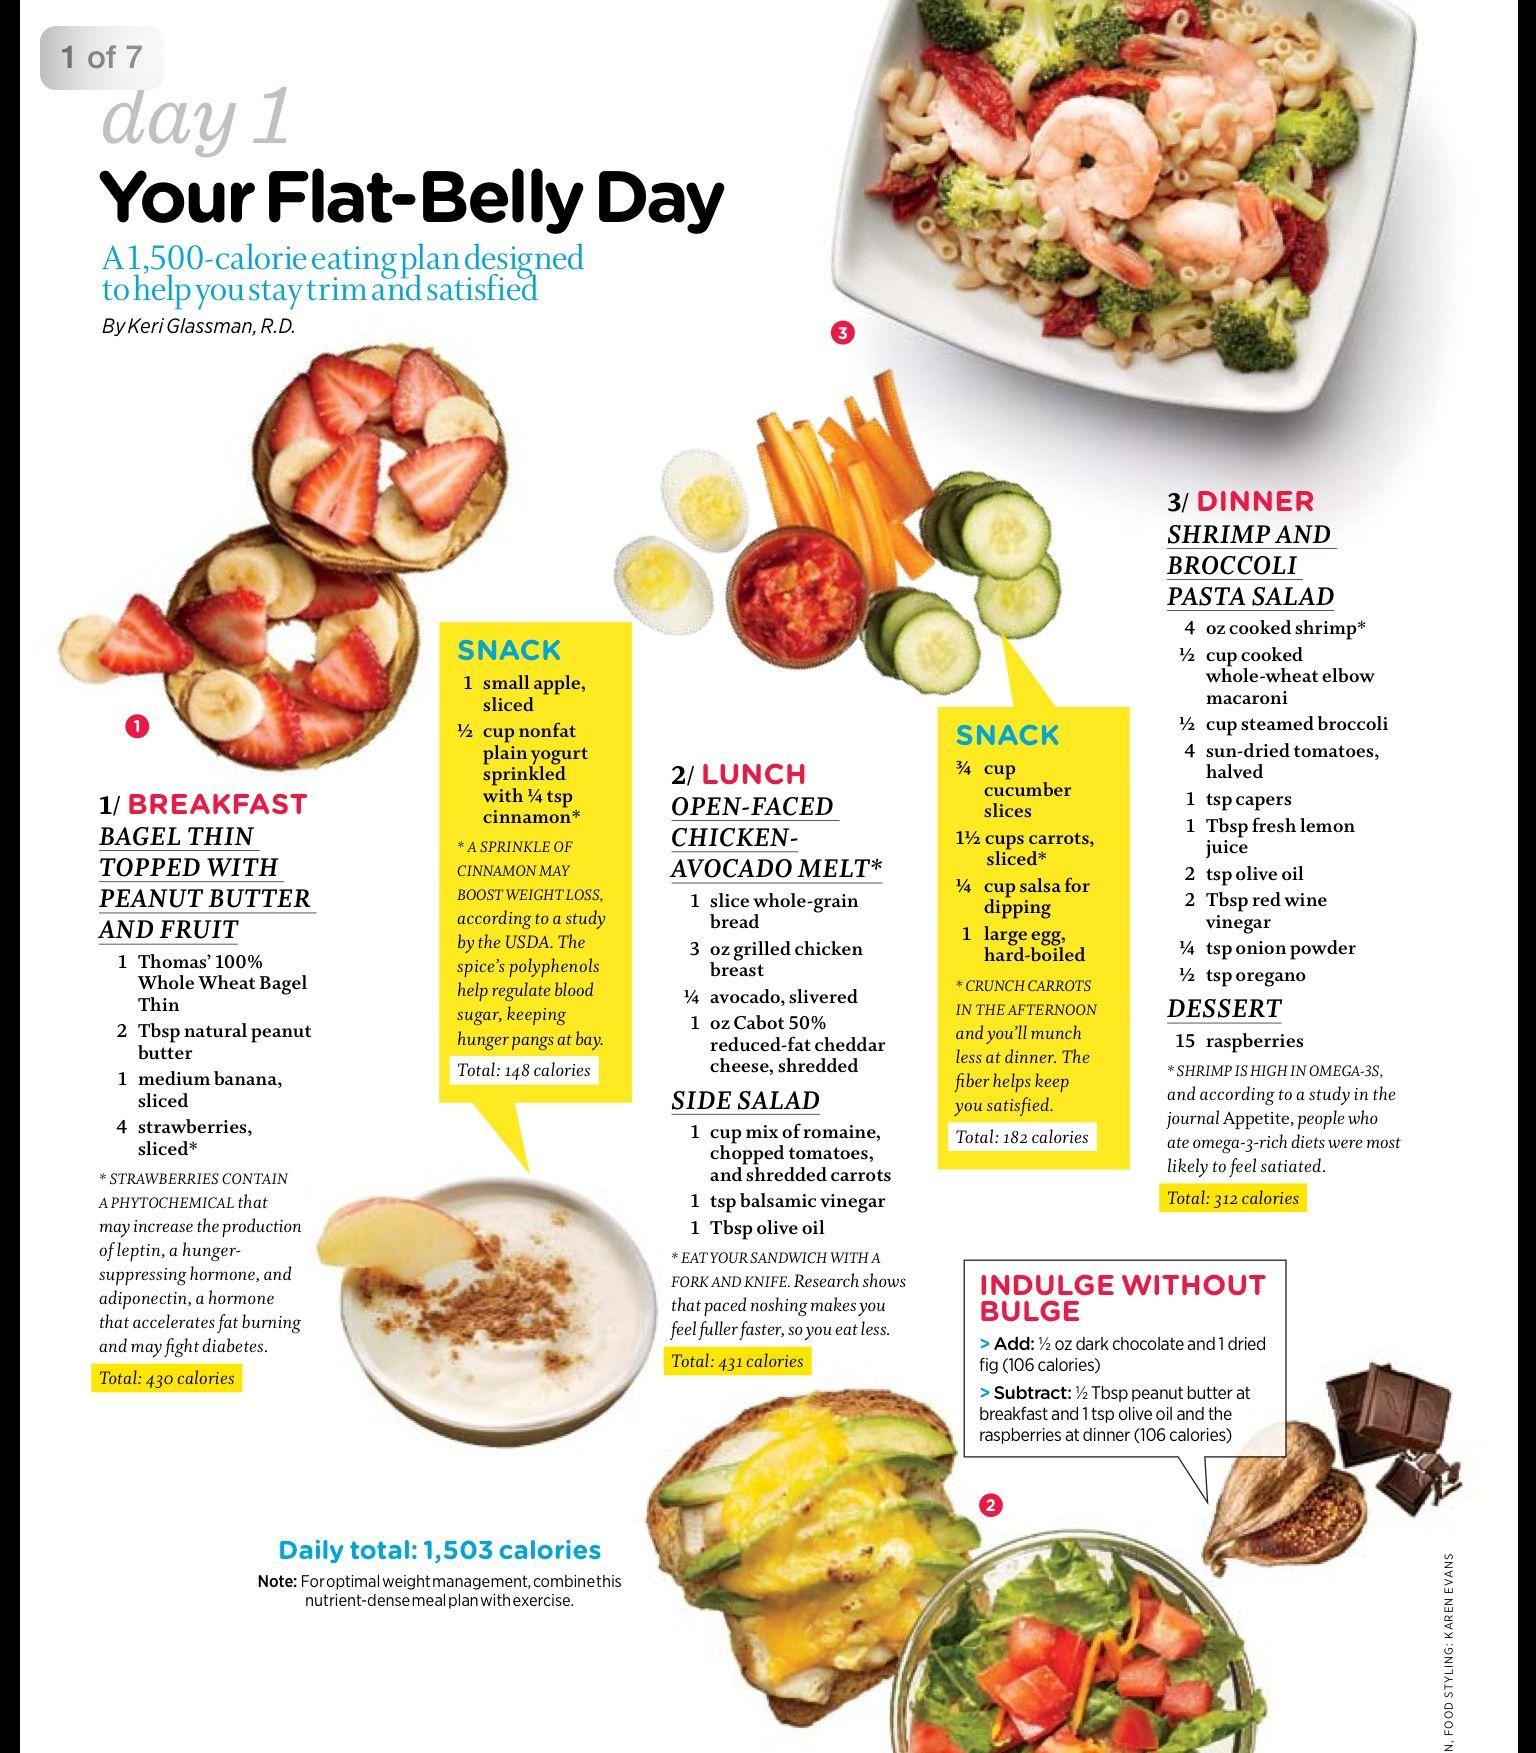 MH's fitness-boosting gluten-free sandwich